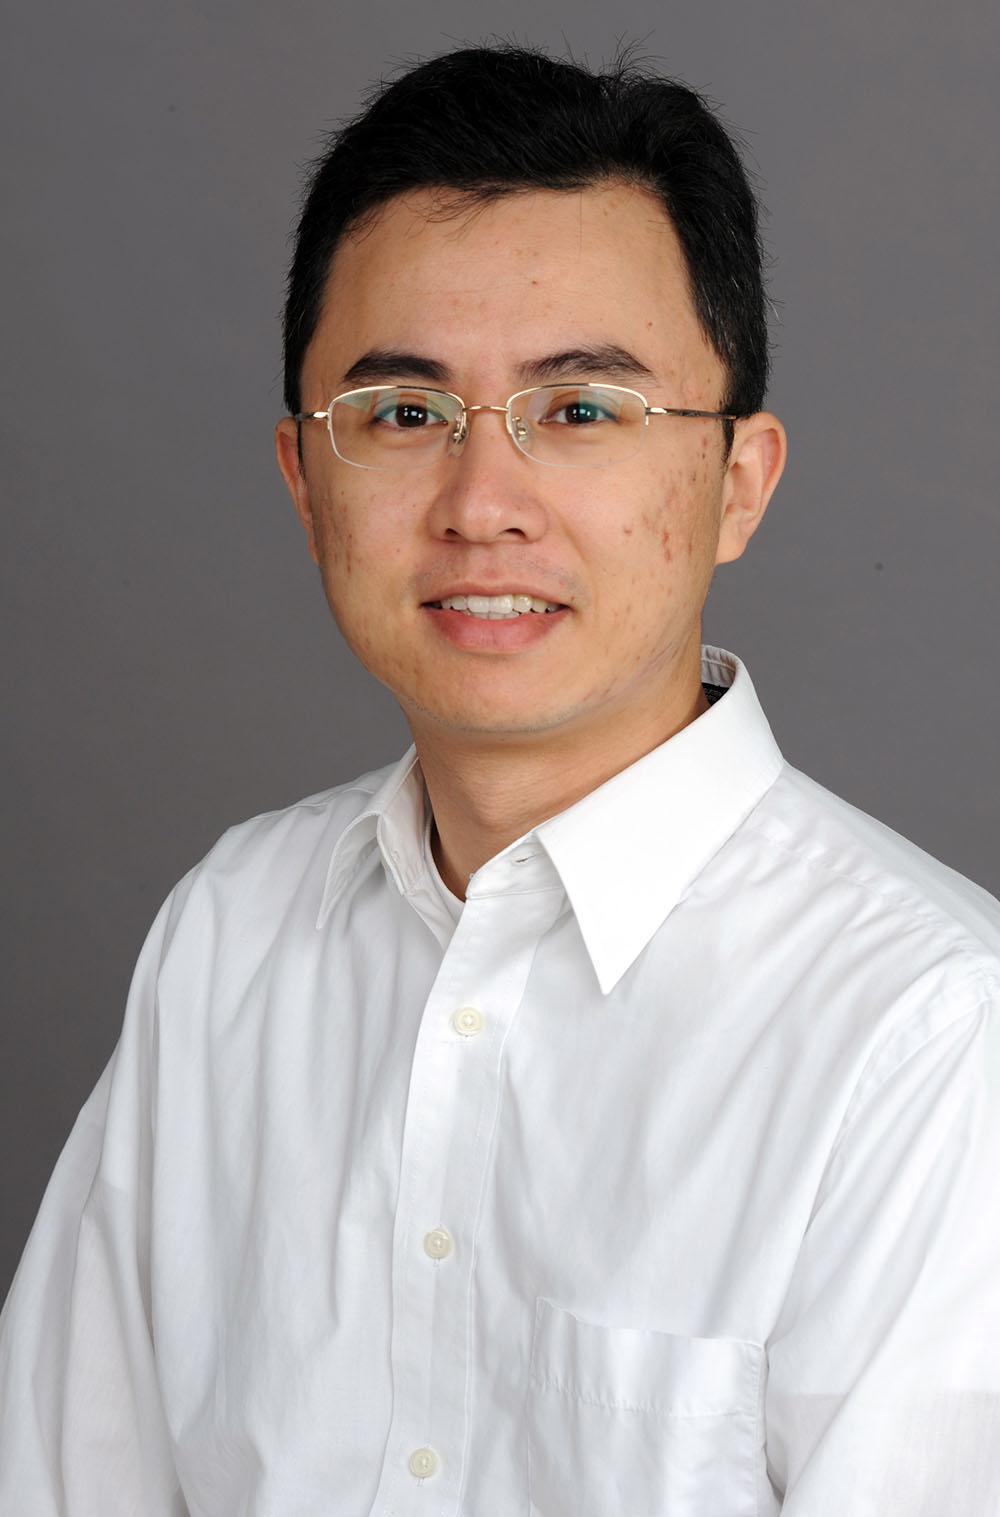 Deng Pan Portrait